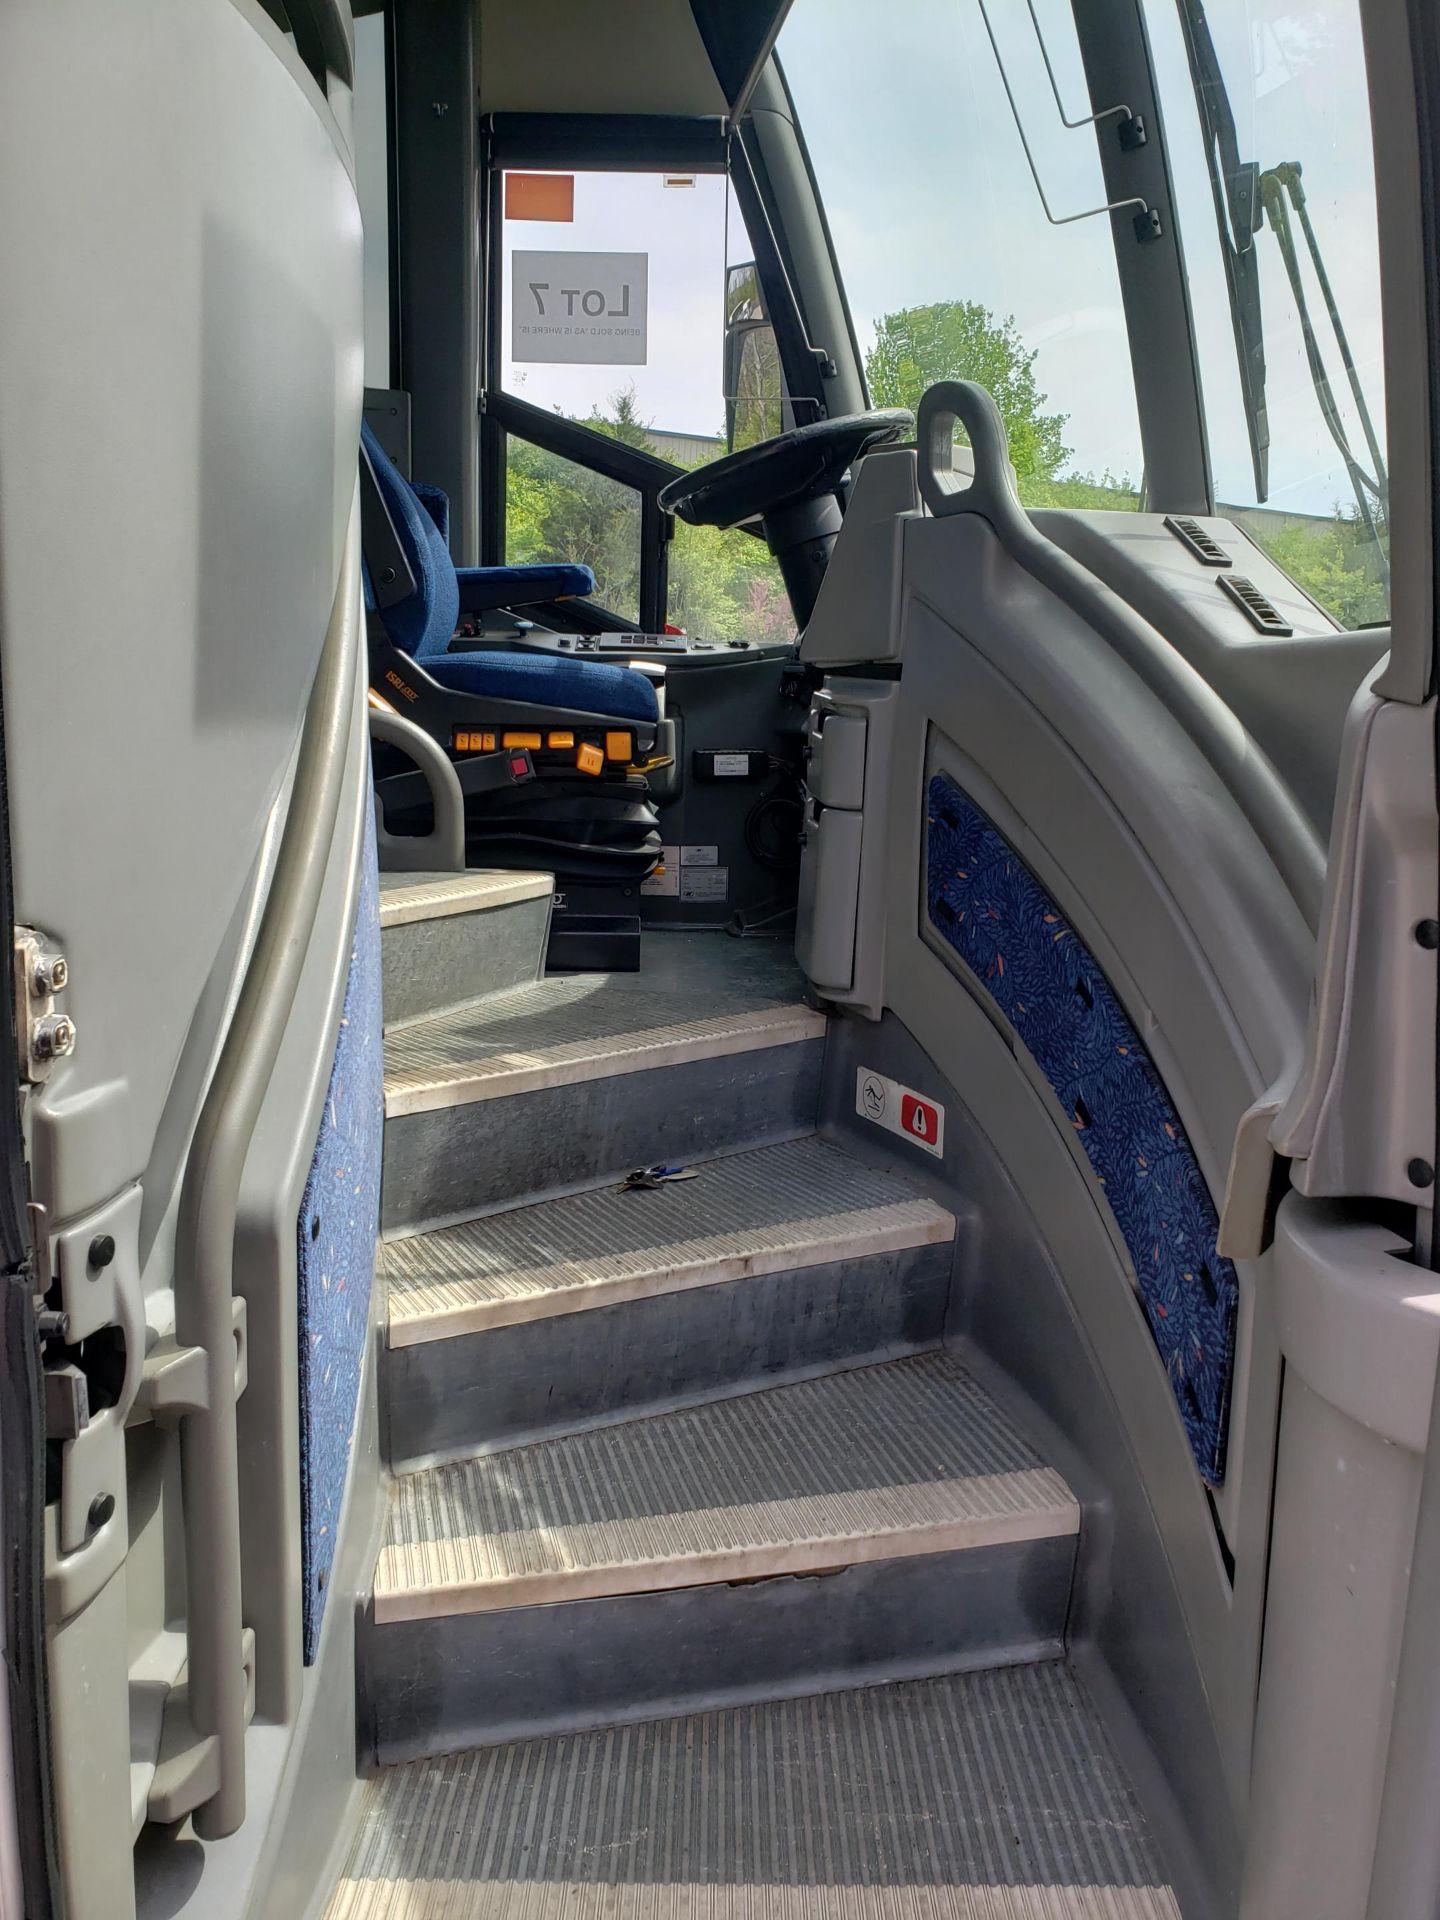 2005 MCI J4500 56-Pass Kneeling Coach Bus - Image 5 of 18